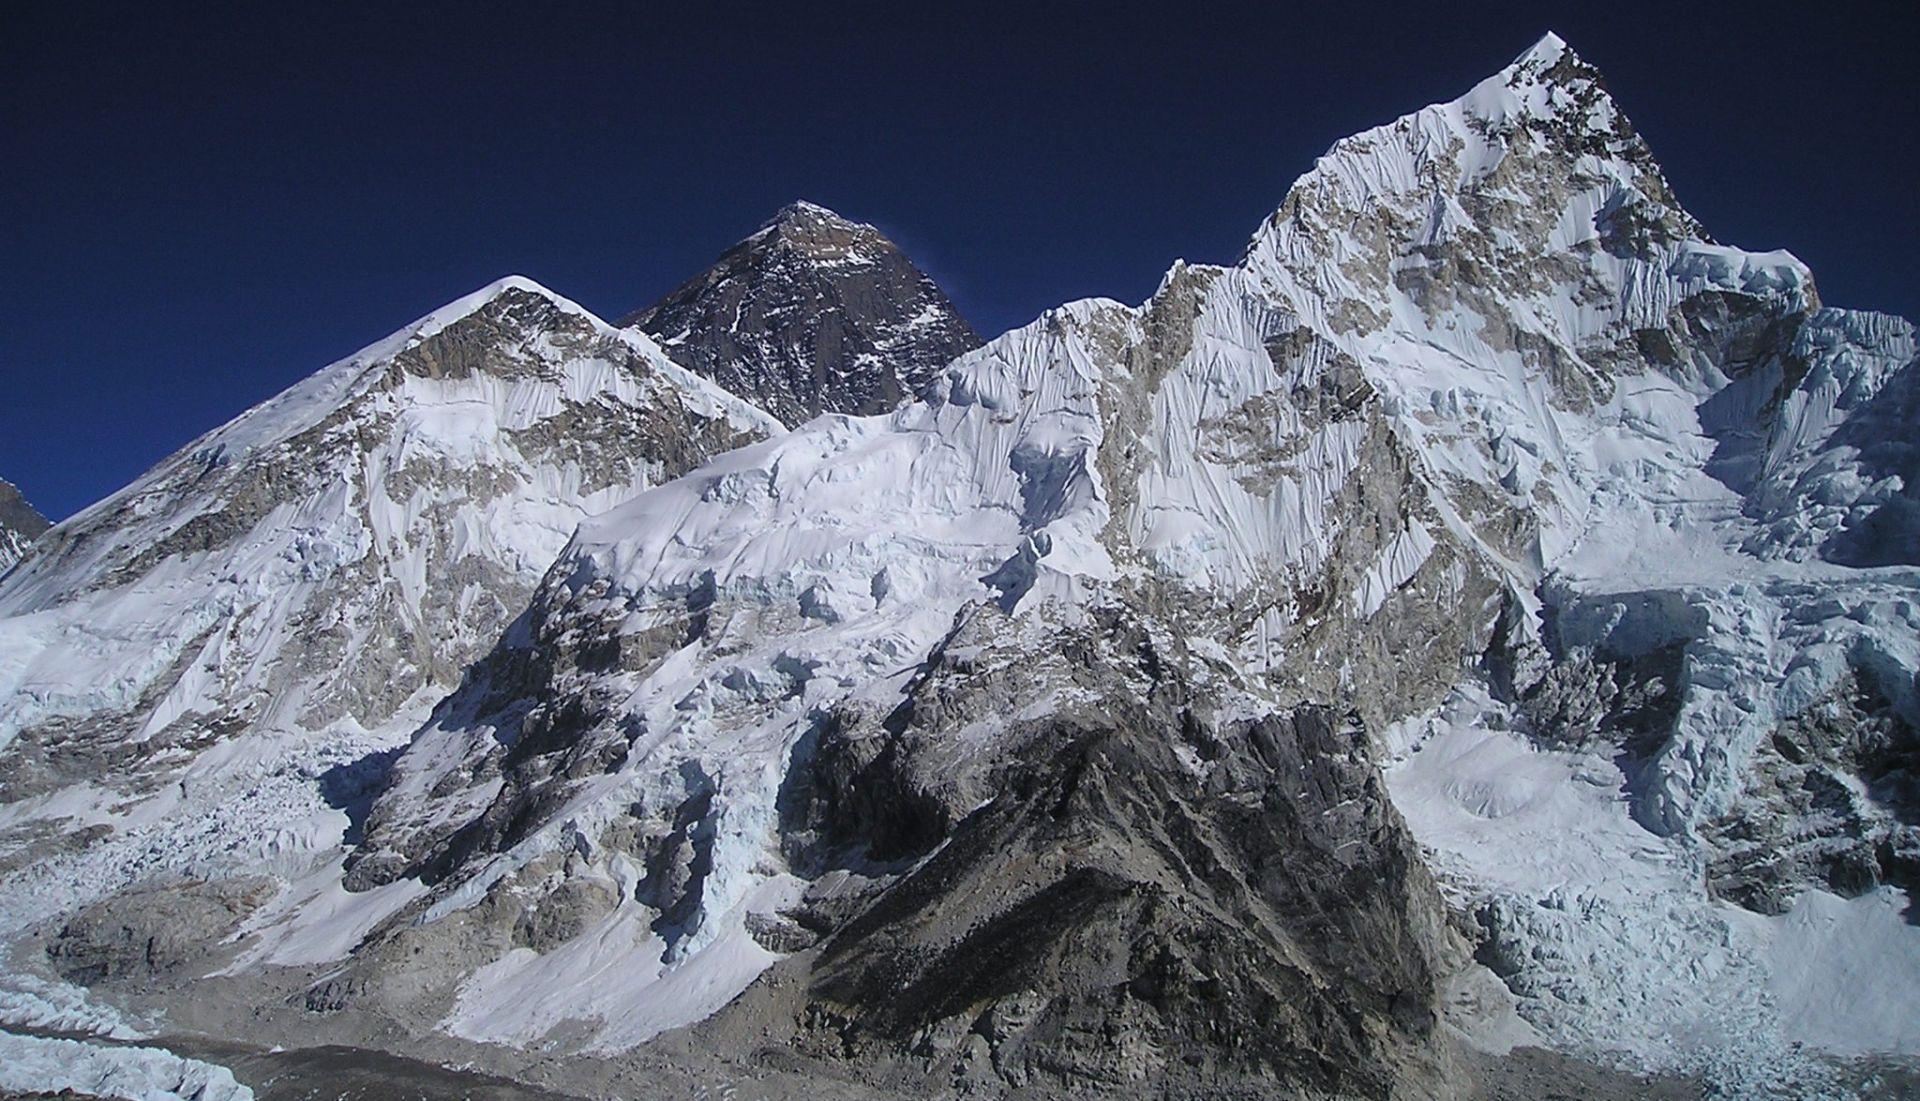 OPASNA PLANINA U tri dana troje mrtvih i dvoje nestalih na Mount Everestu